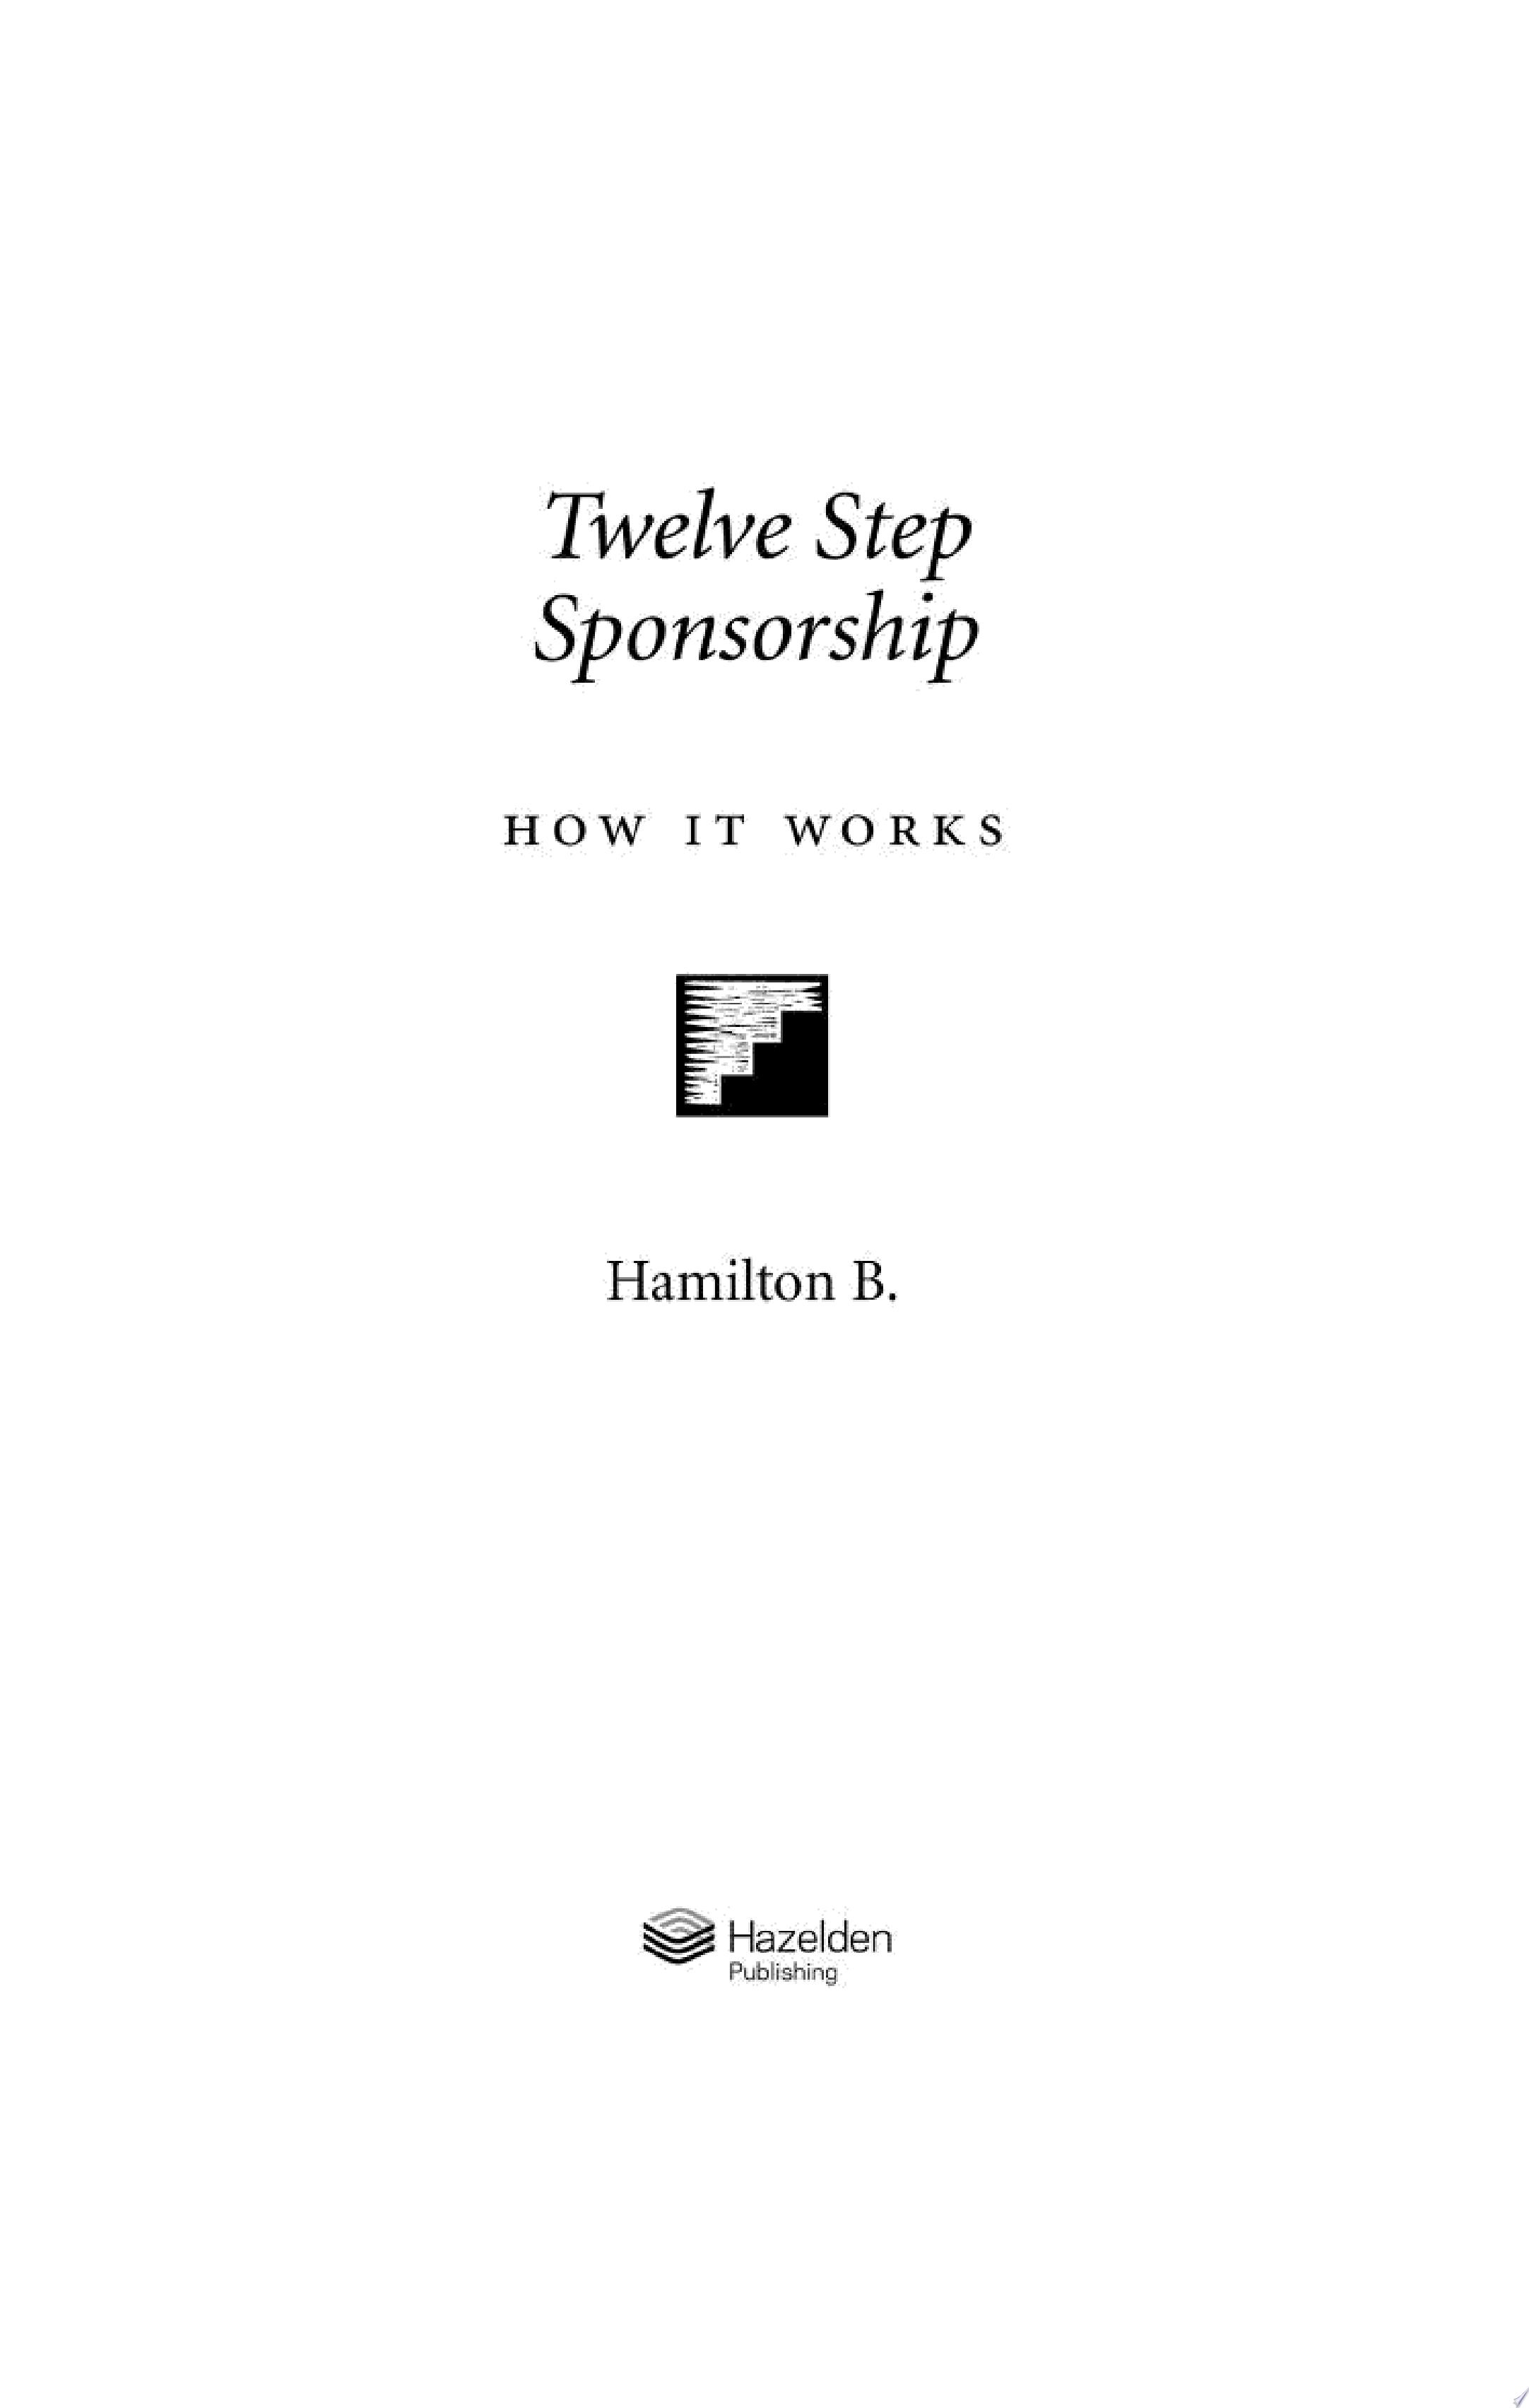 Twelve Step Sponsorship